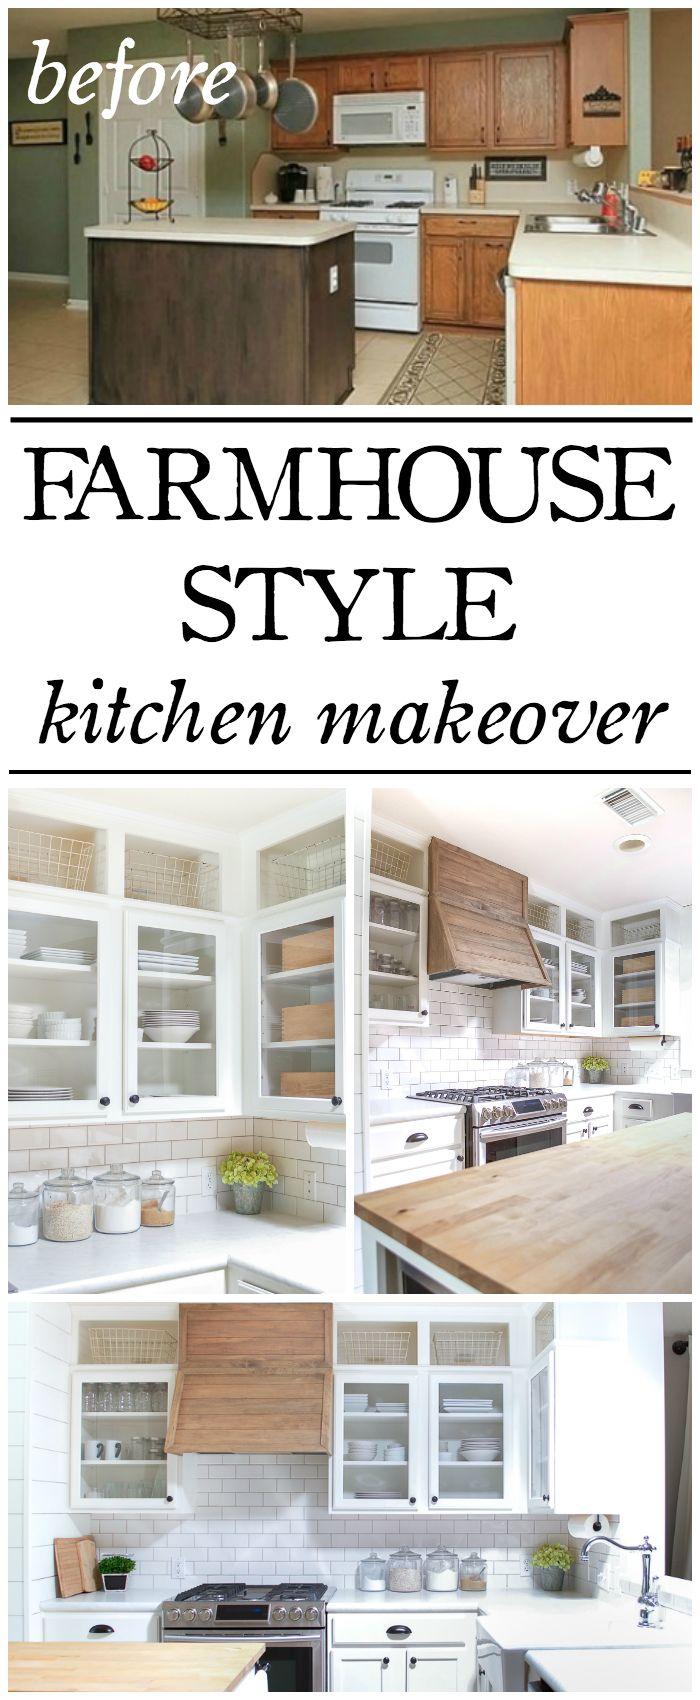 best interior design ideas images on pinterest home ideas